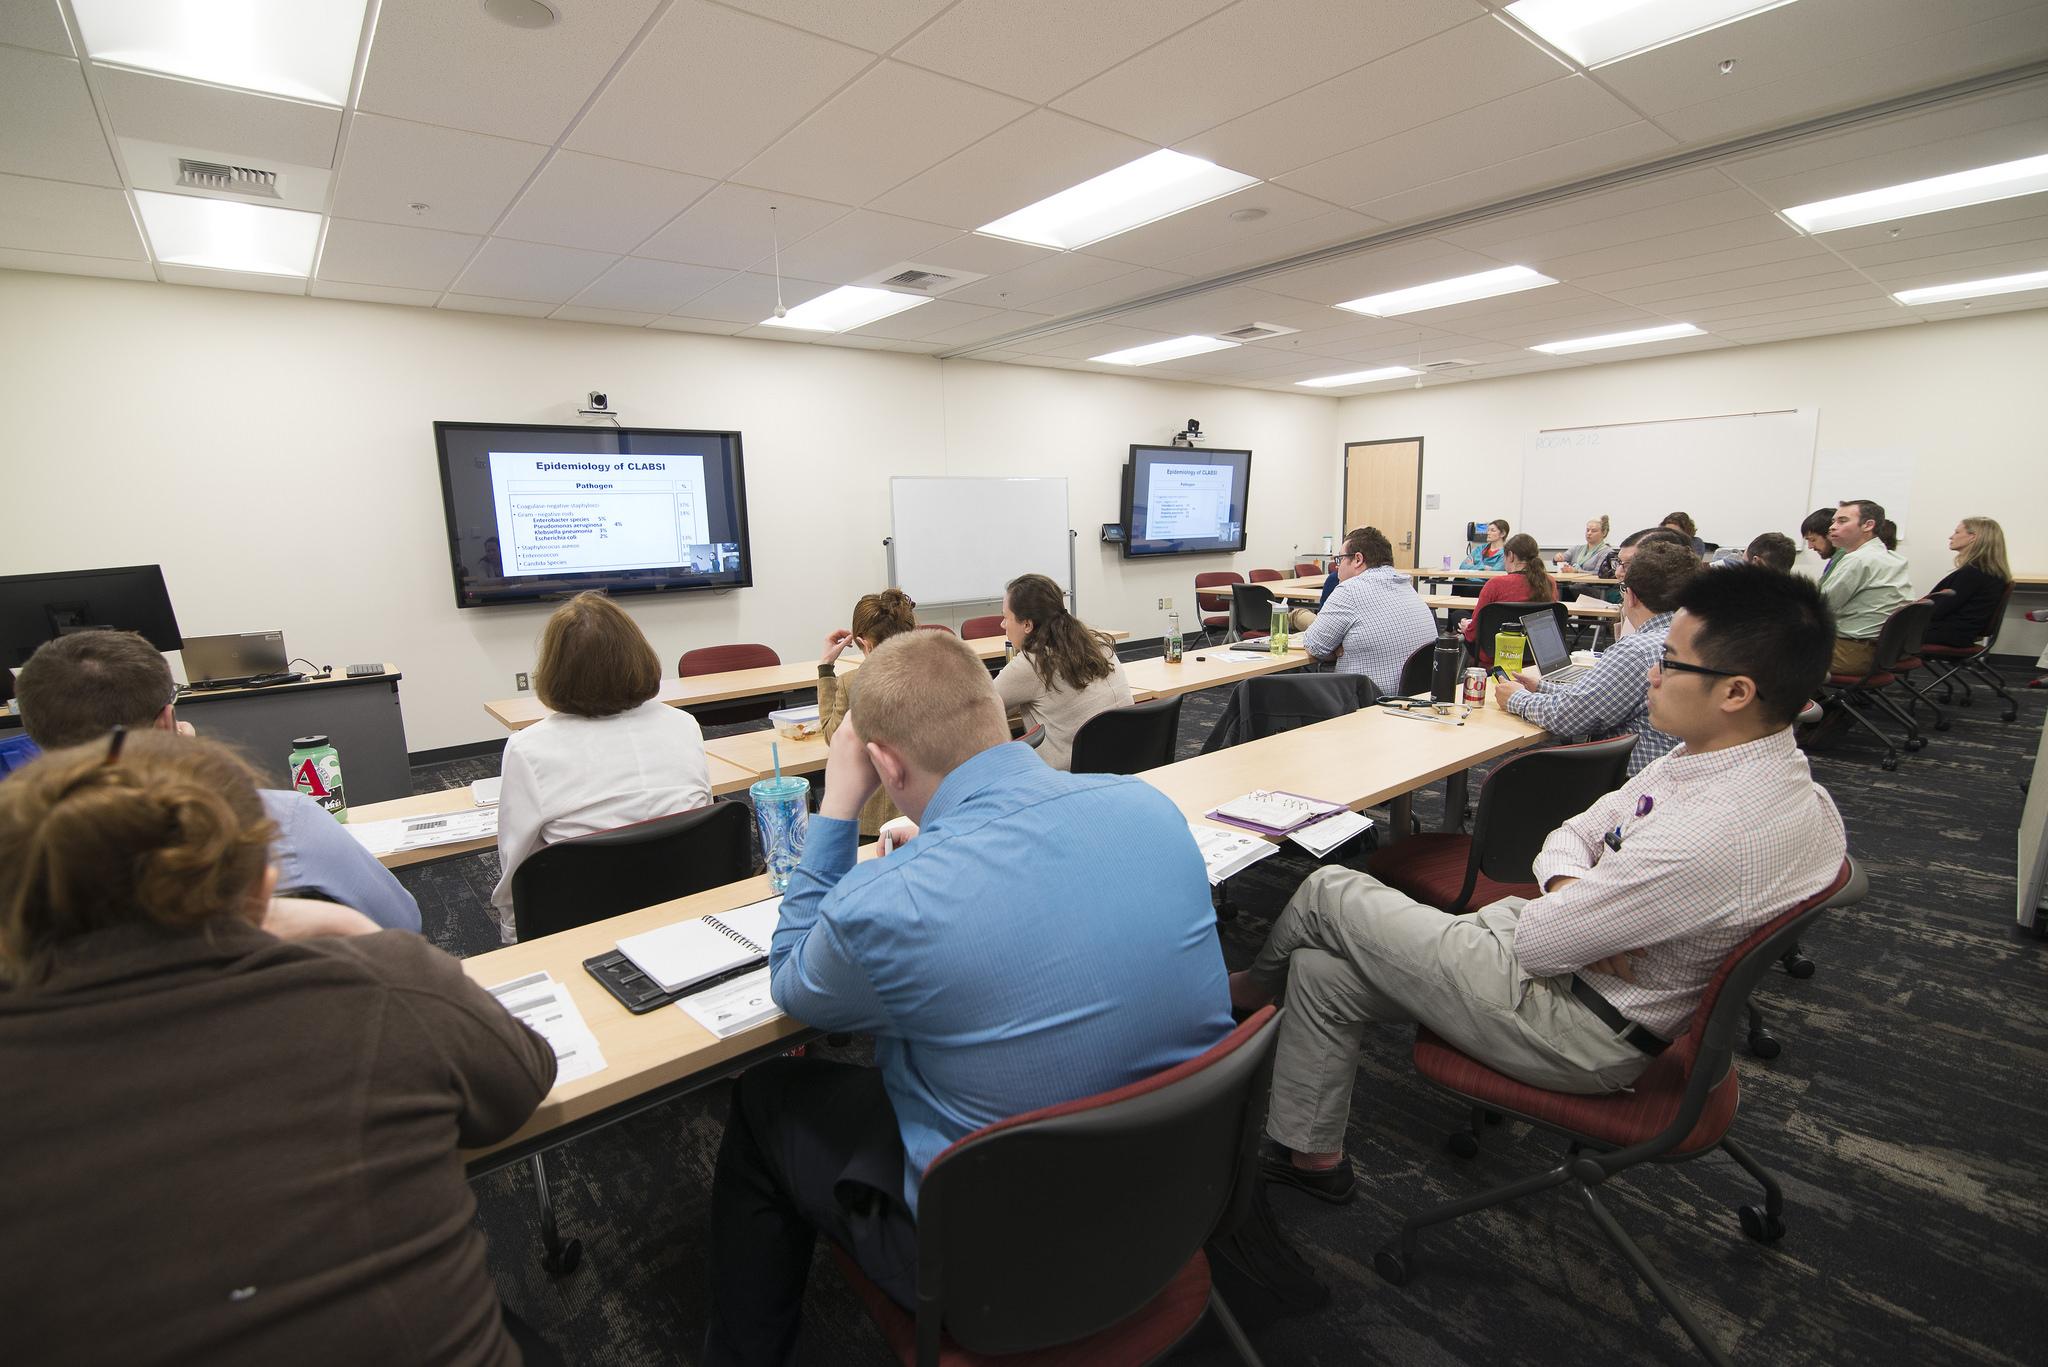 Classroom in the Spokane Teaching Health Clinic